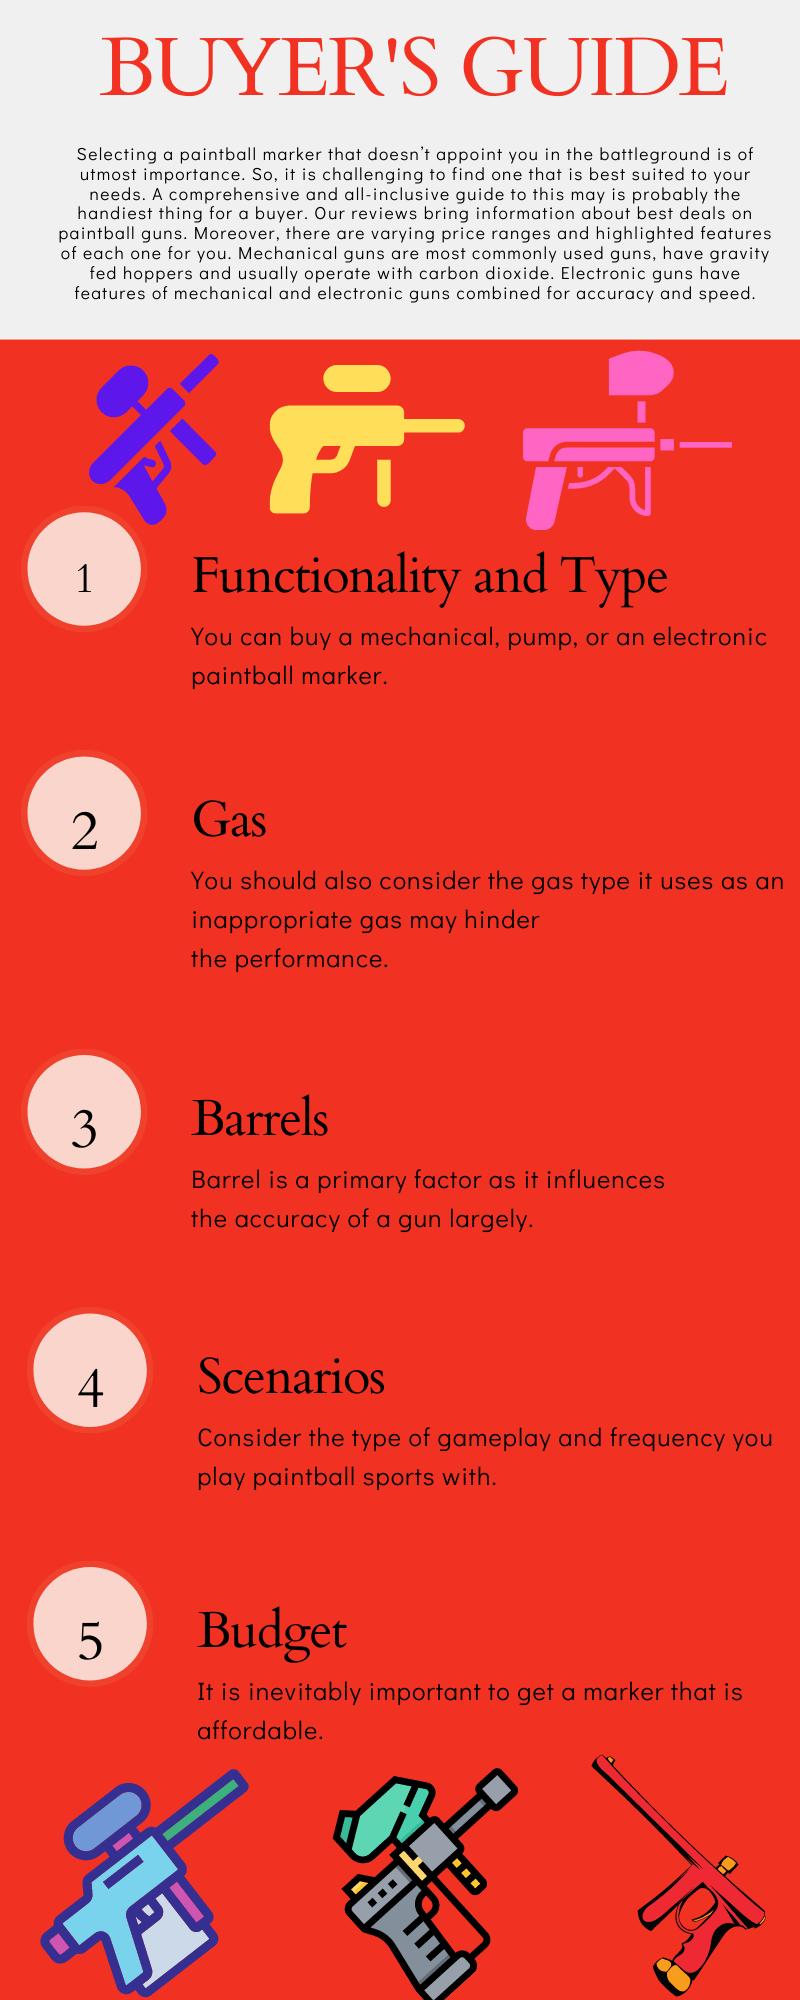 Best Paintball Gun Under 100 Buyer's Guide